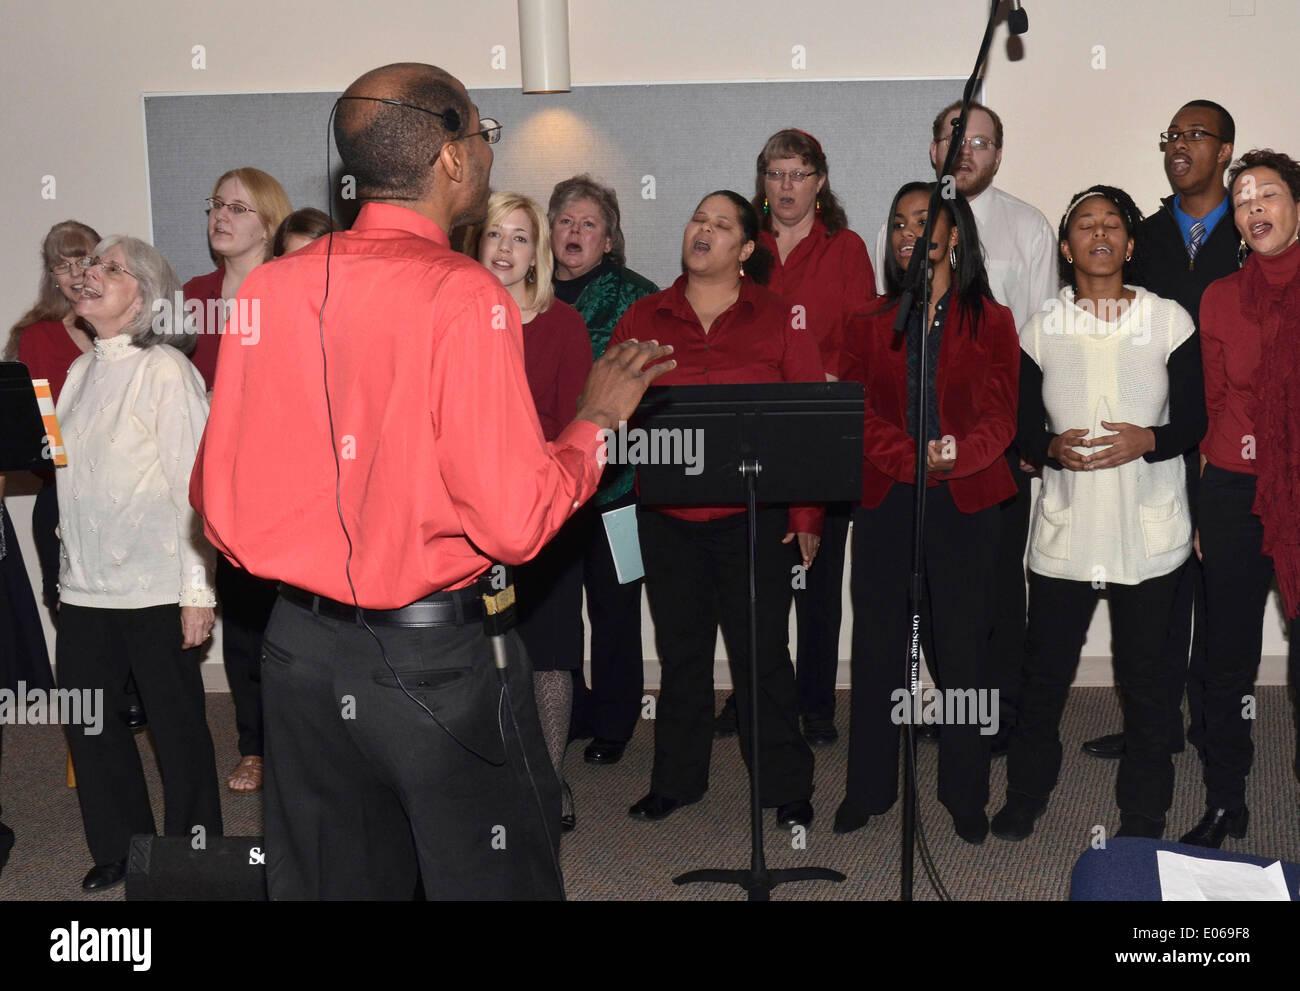 A choir director conducts a church choir in Riverdale Park, Maryland - Stock Image